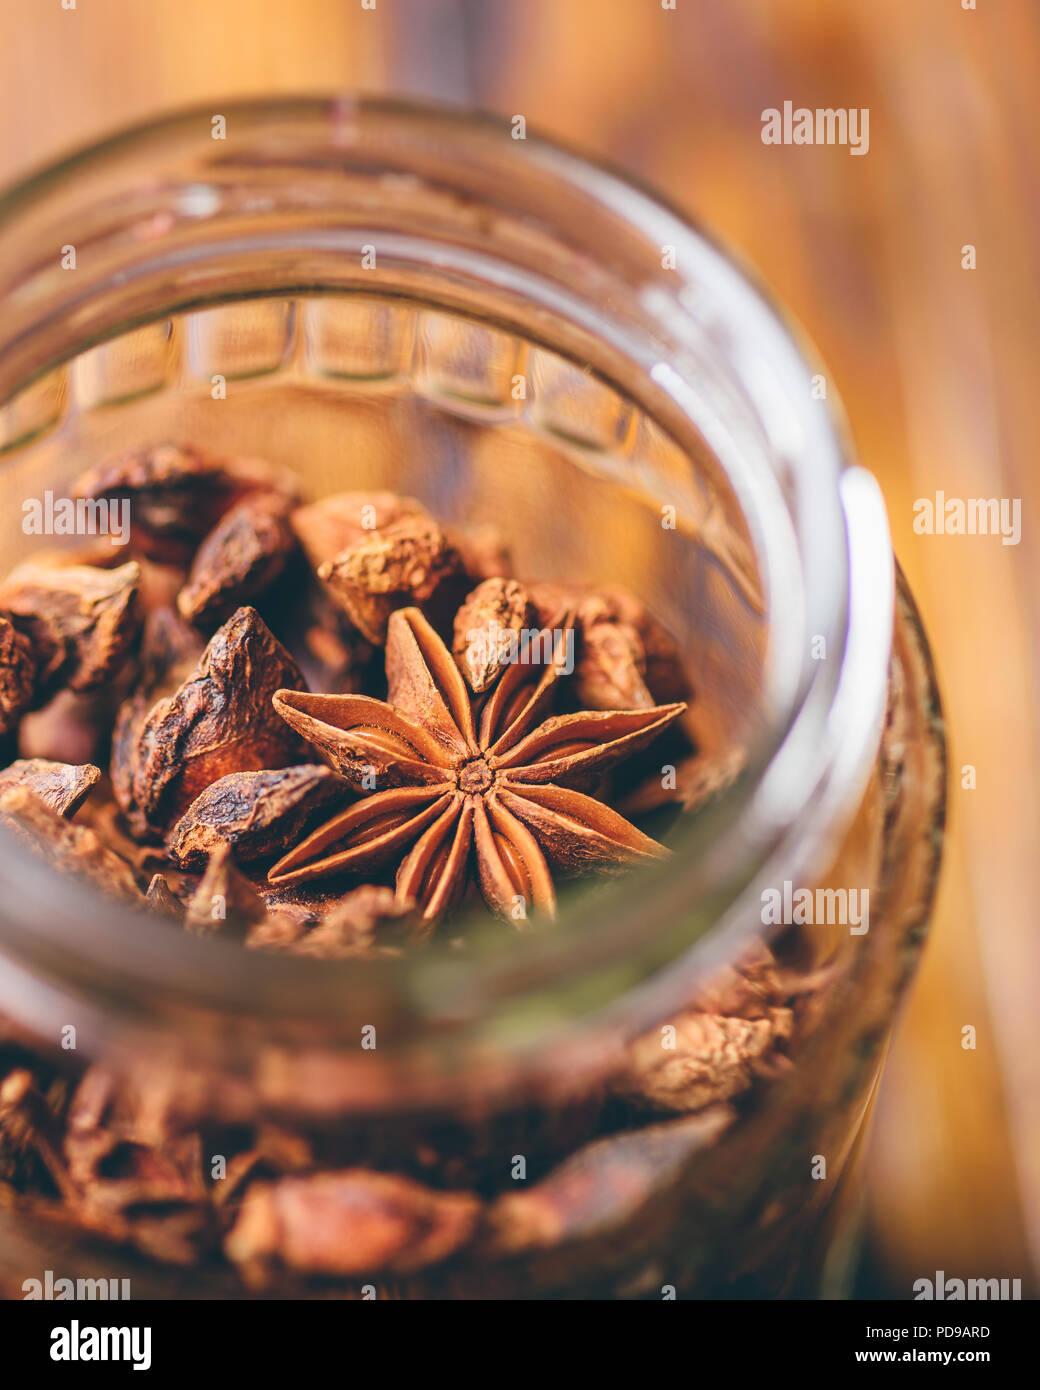 Jar of Star Aniseeds. View through the Bottleneck. Vertical Orientation. - Stock Image